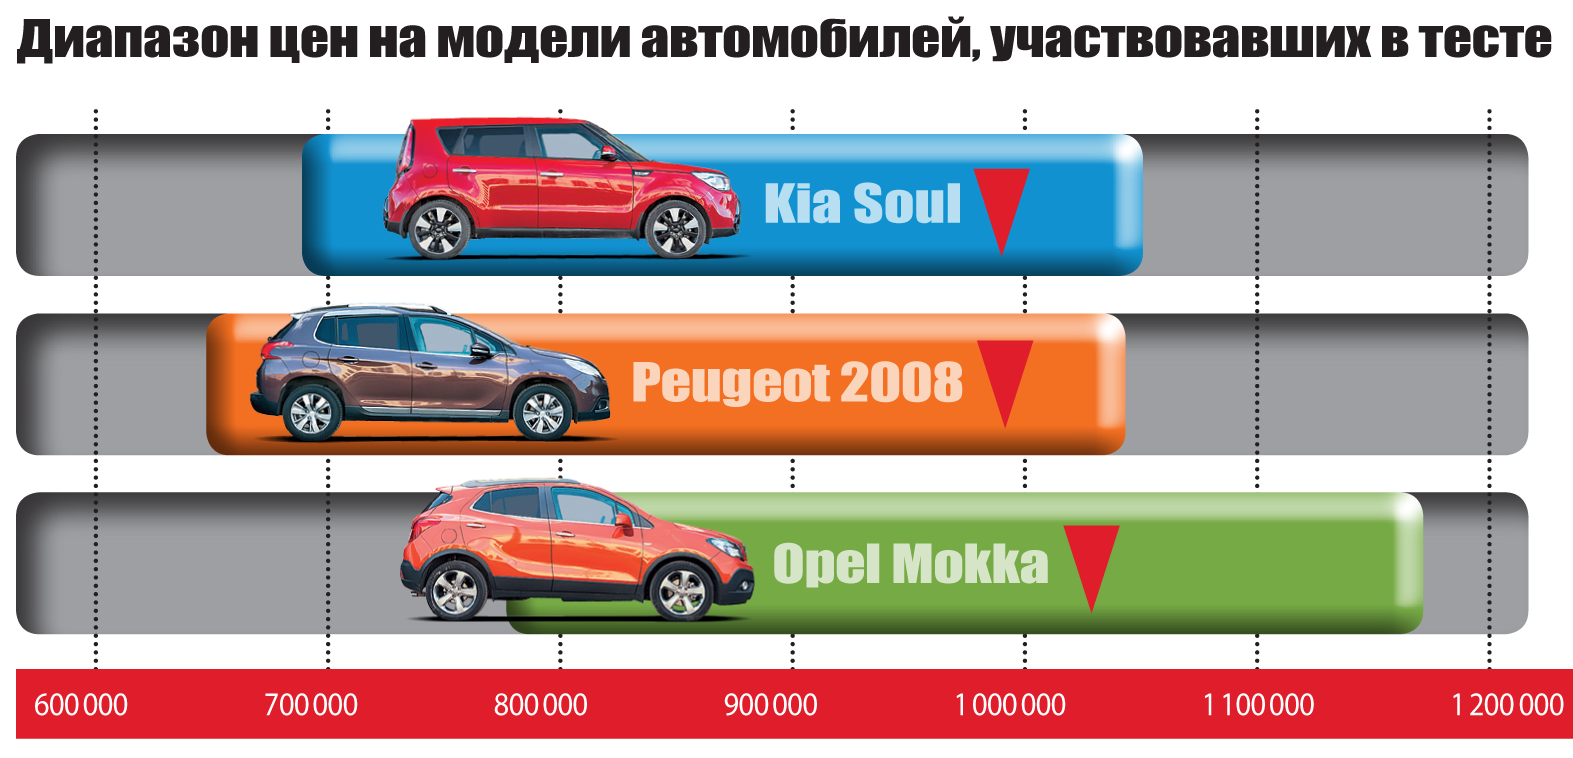 KiaSoul, Peugeot 2008и Opel Mokka